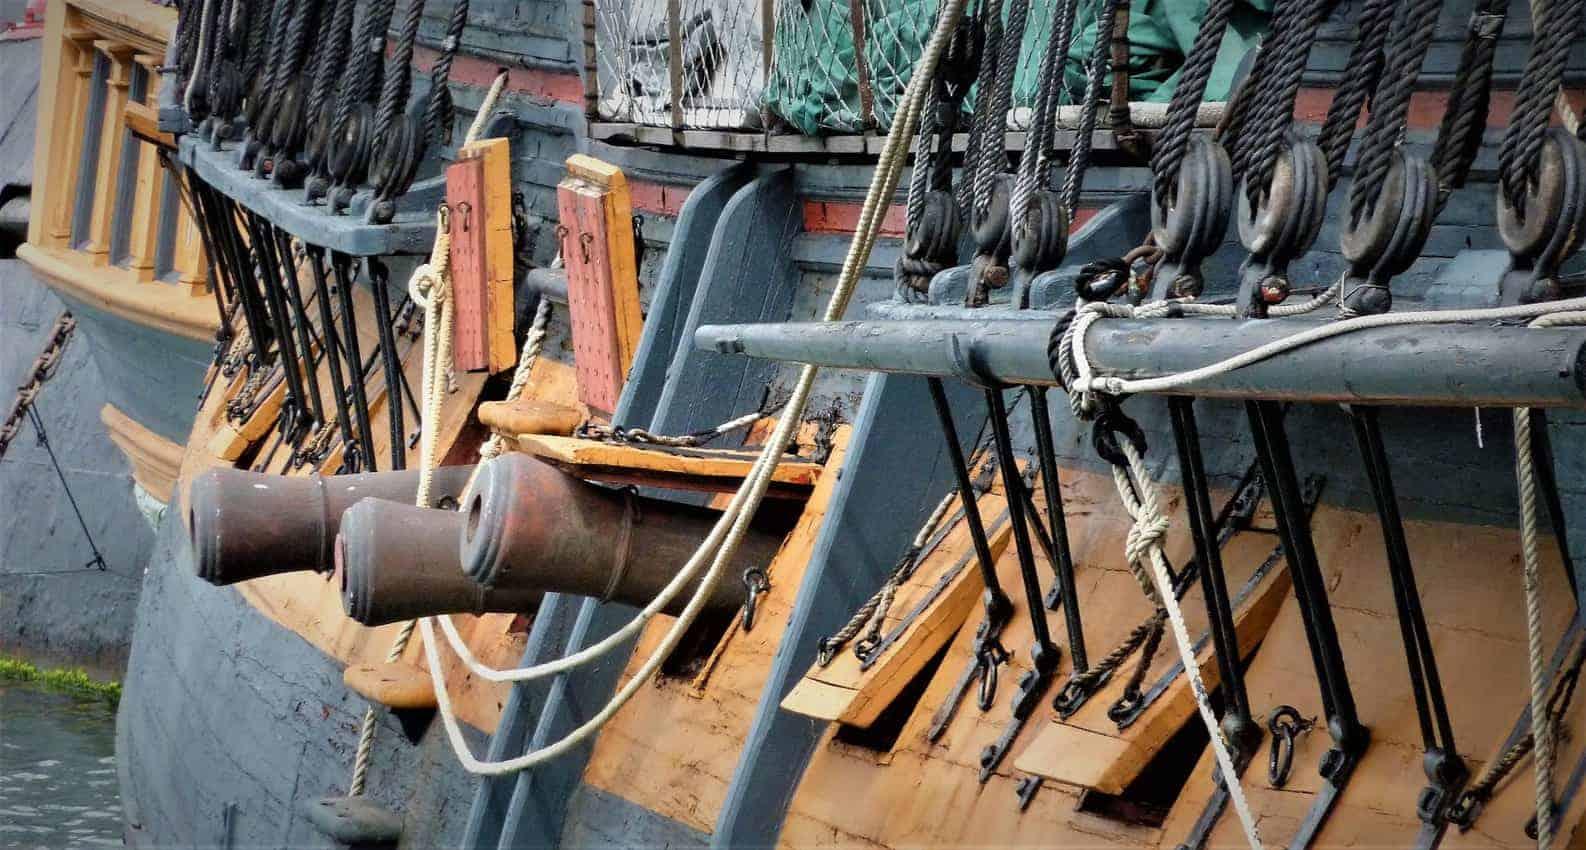 guns on the HMS Surprise